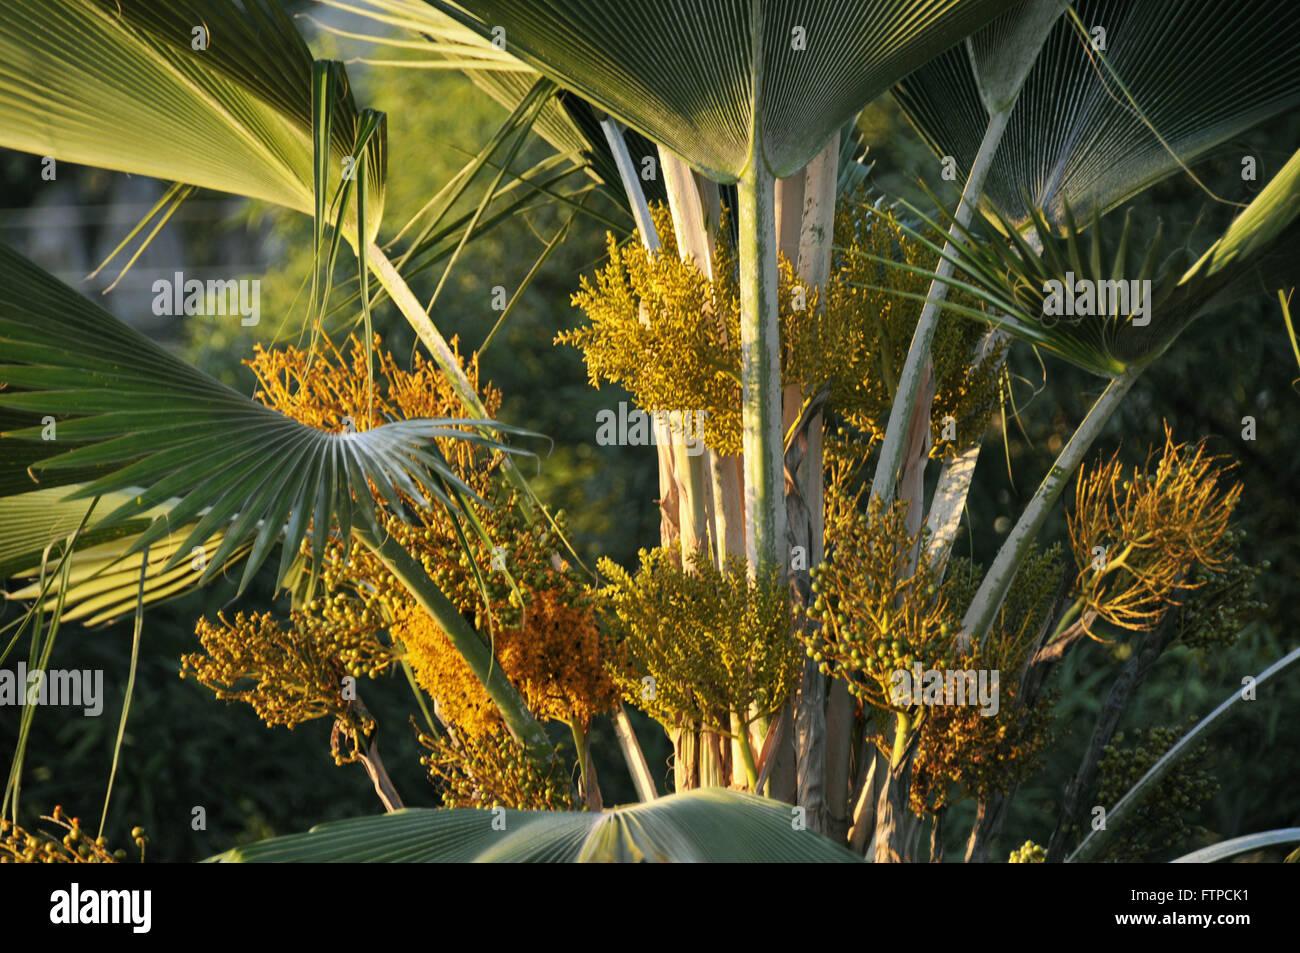 Flower Carnauba - prunifera Copernicia - Stock Image